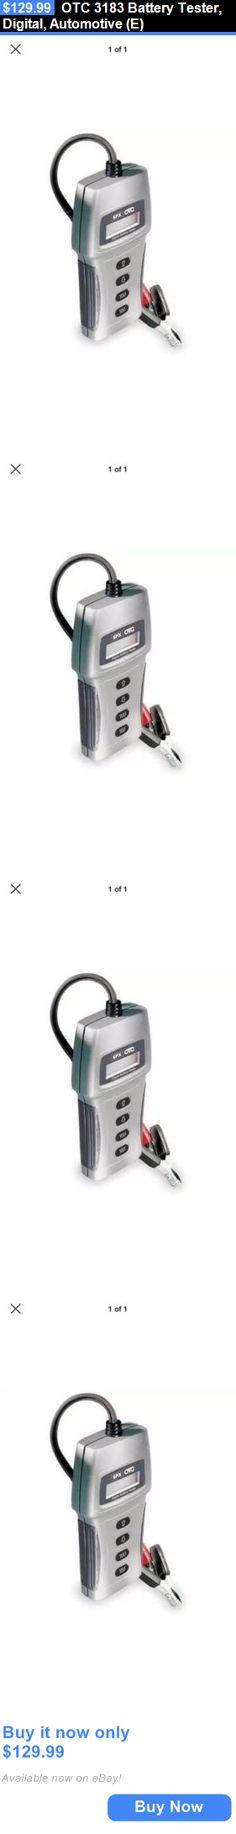 Battery Testers: Otc 3183 Battery Tester, Digital, Automotive (E) BUY IT NOW ONLY: $129.99